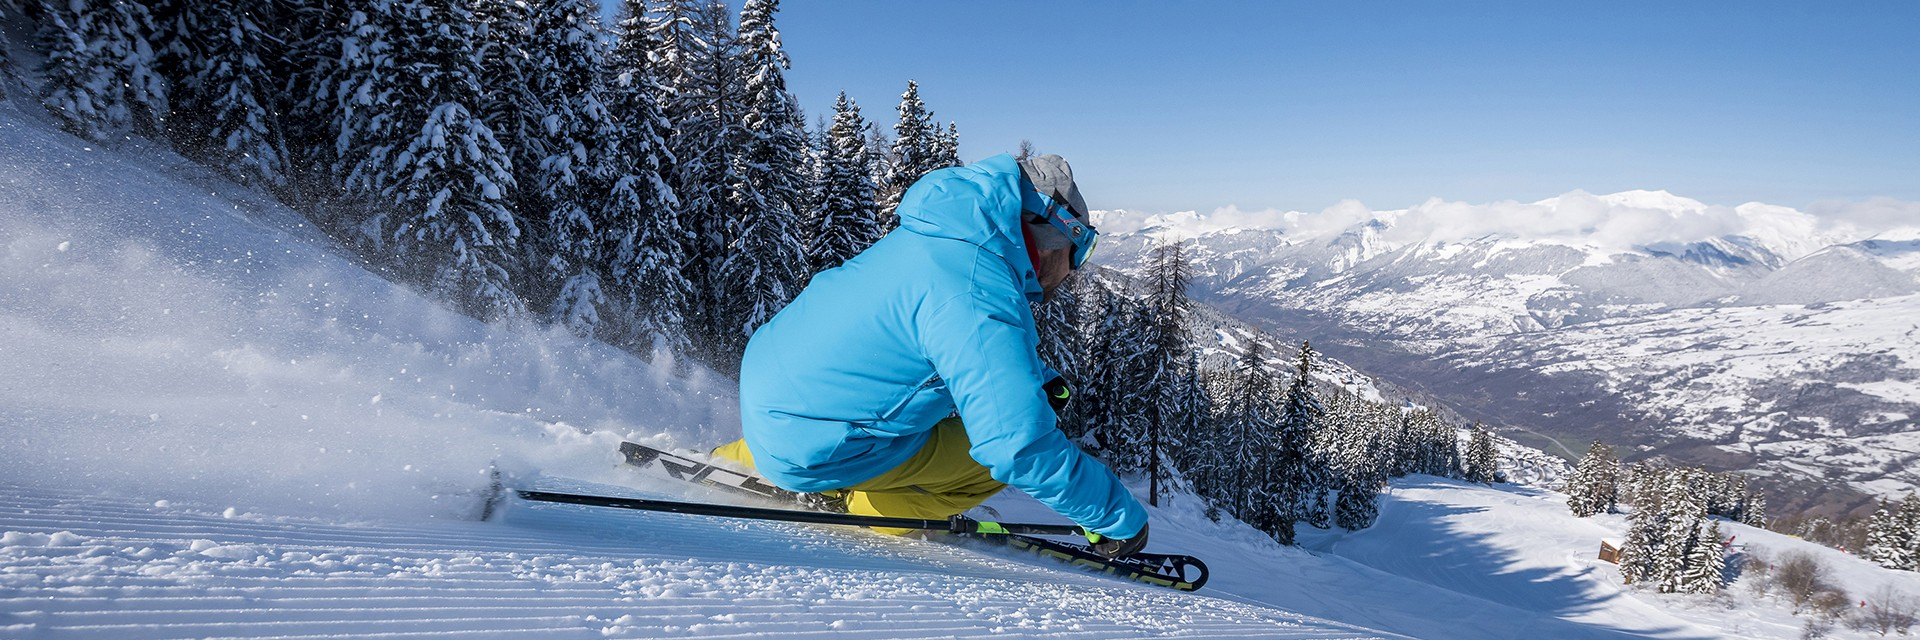 Piste de ski domaine Peisey-Vallandry Paradiski